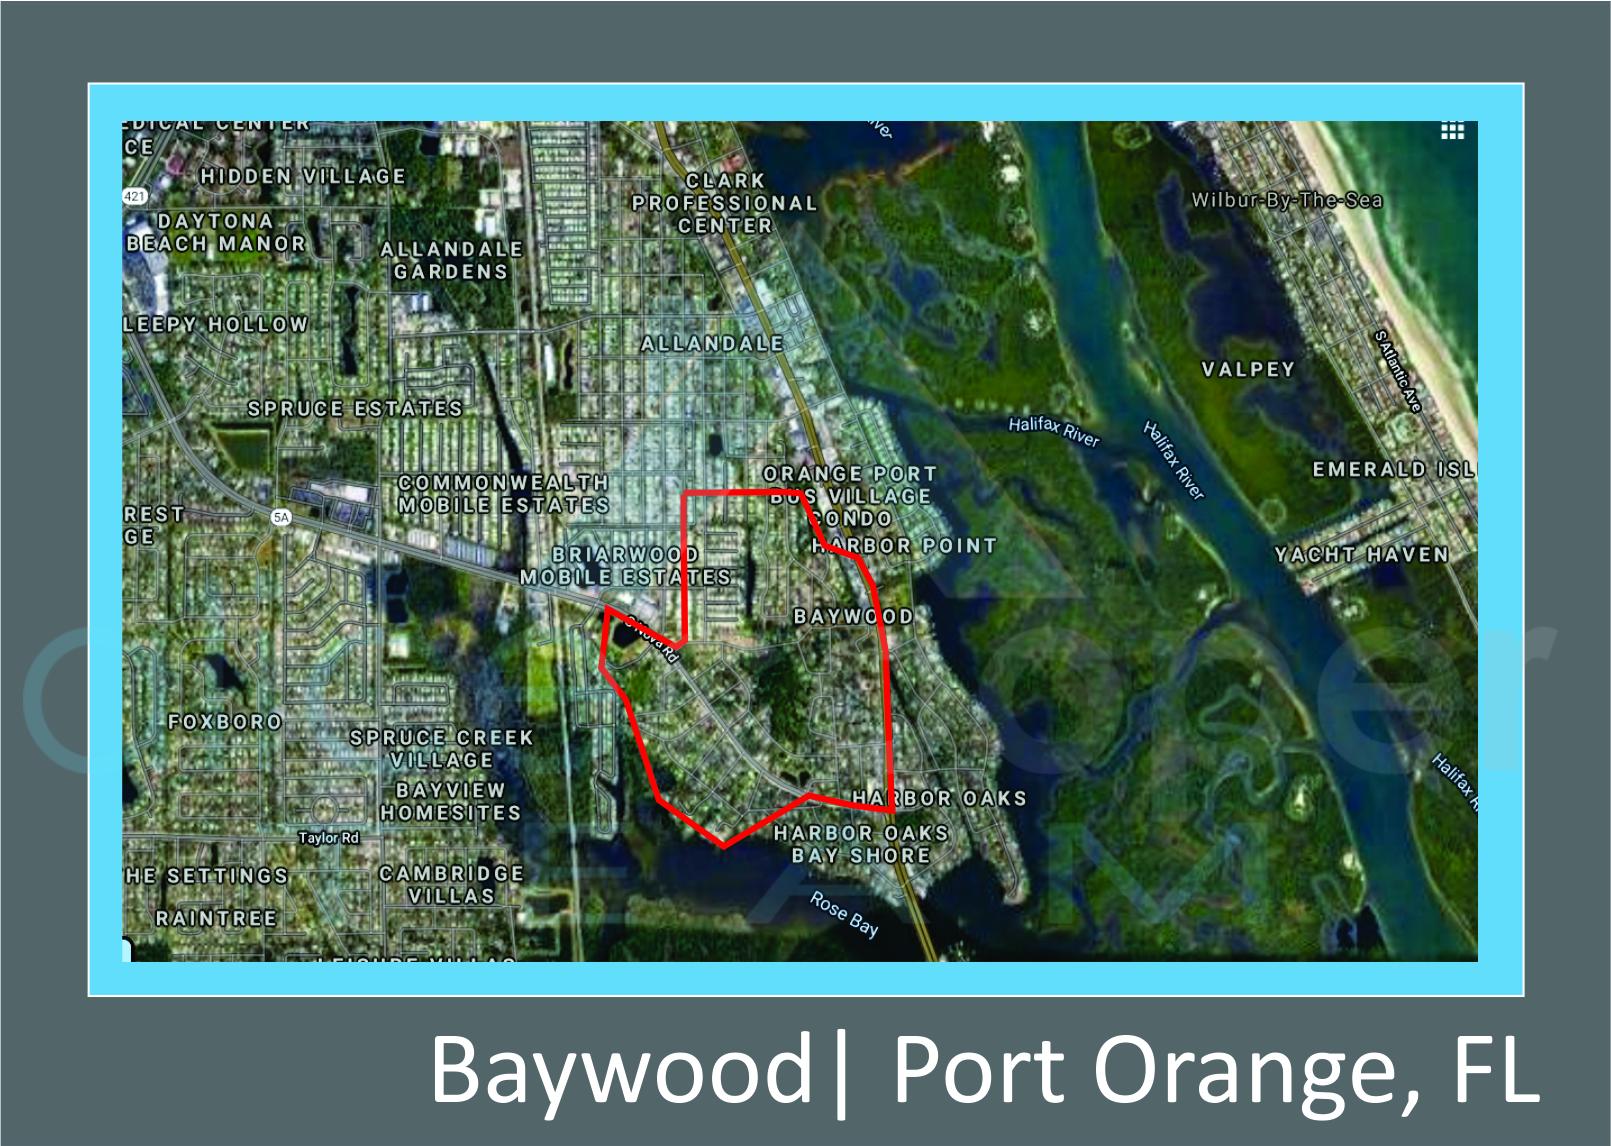 Map of Baywood Port Orange, FL